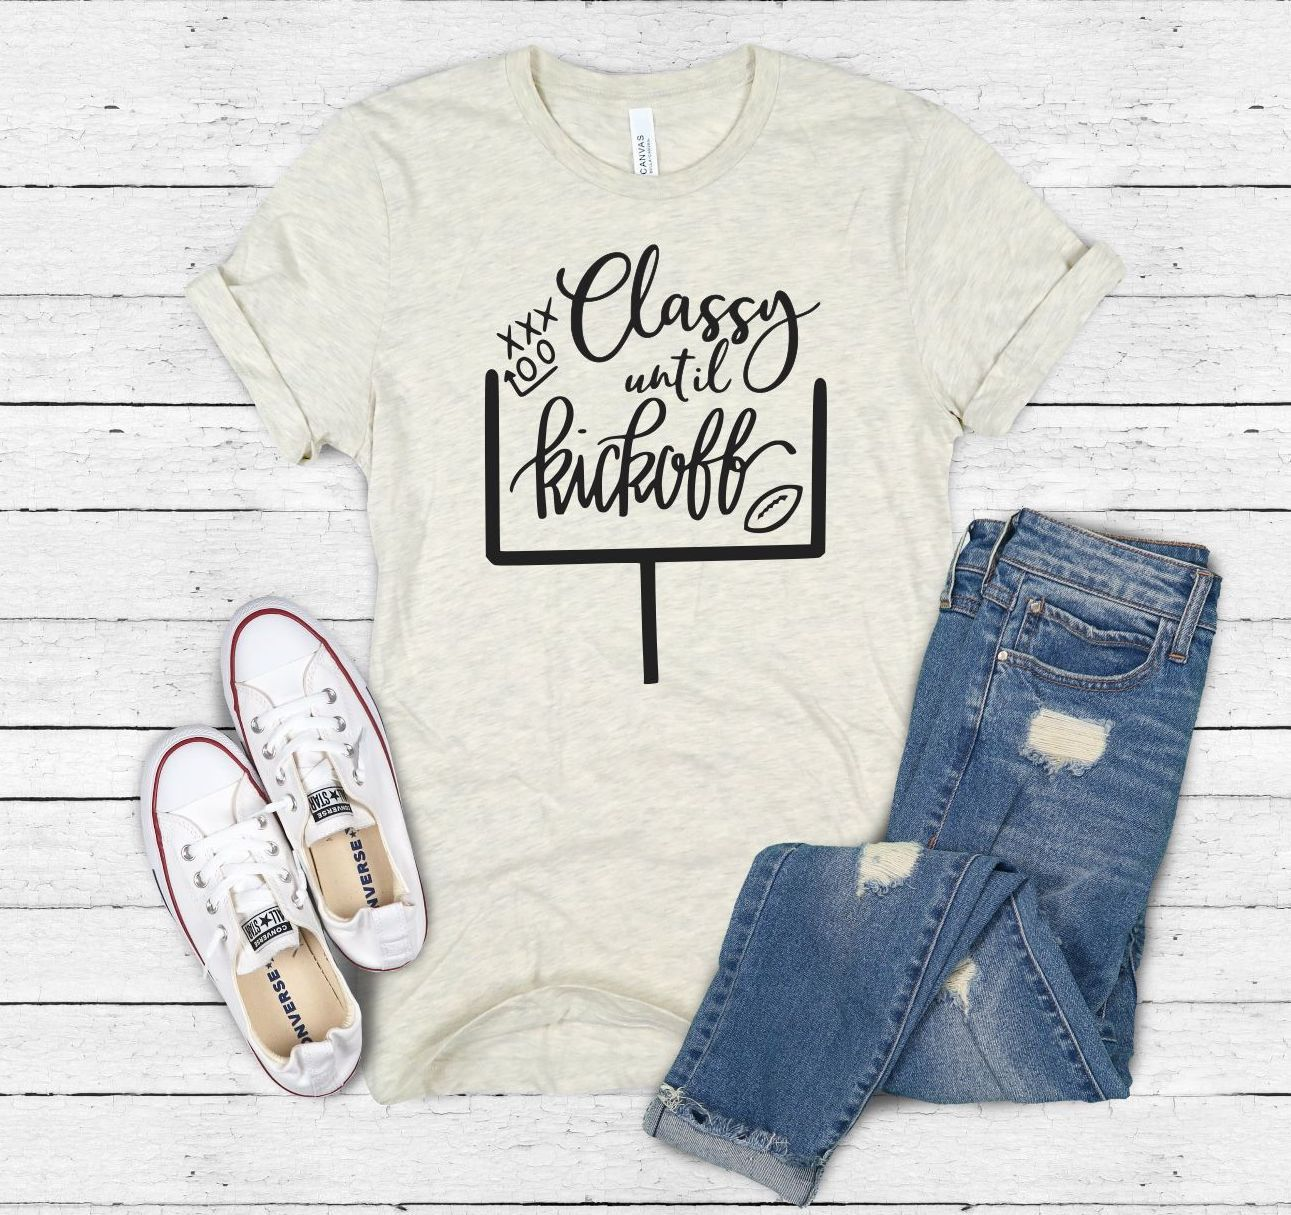 Classy Until Kickoff Shirt, HANDLETTERED, Football Mom